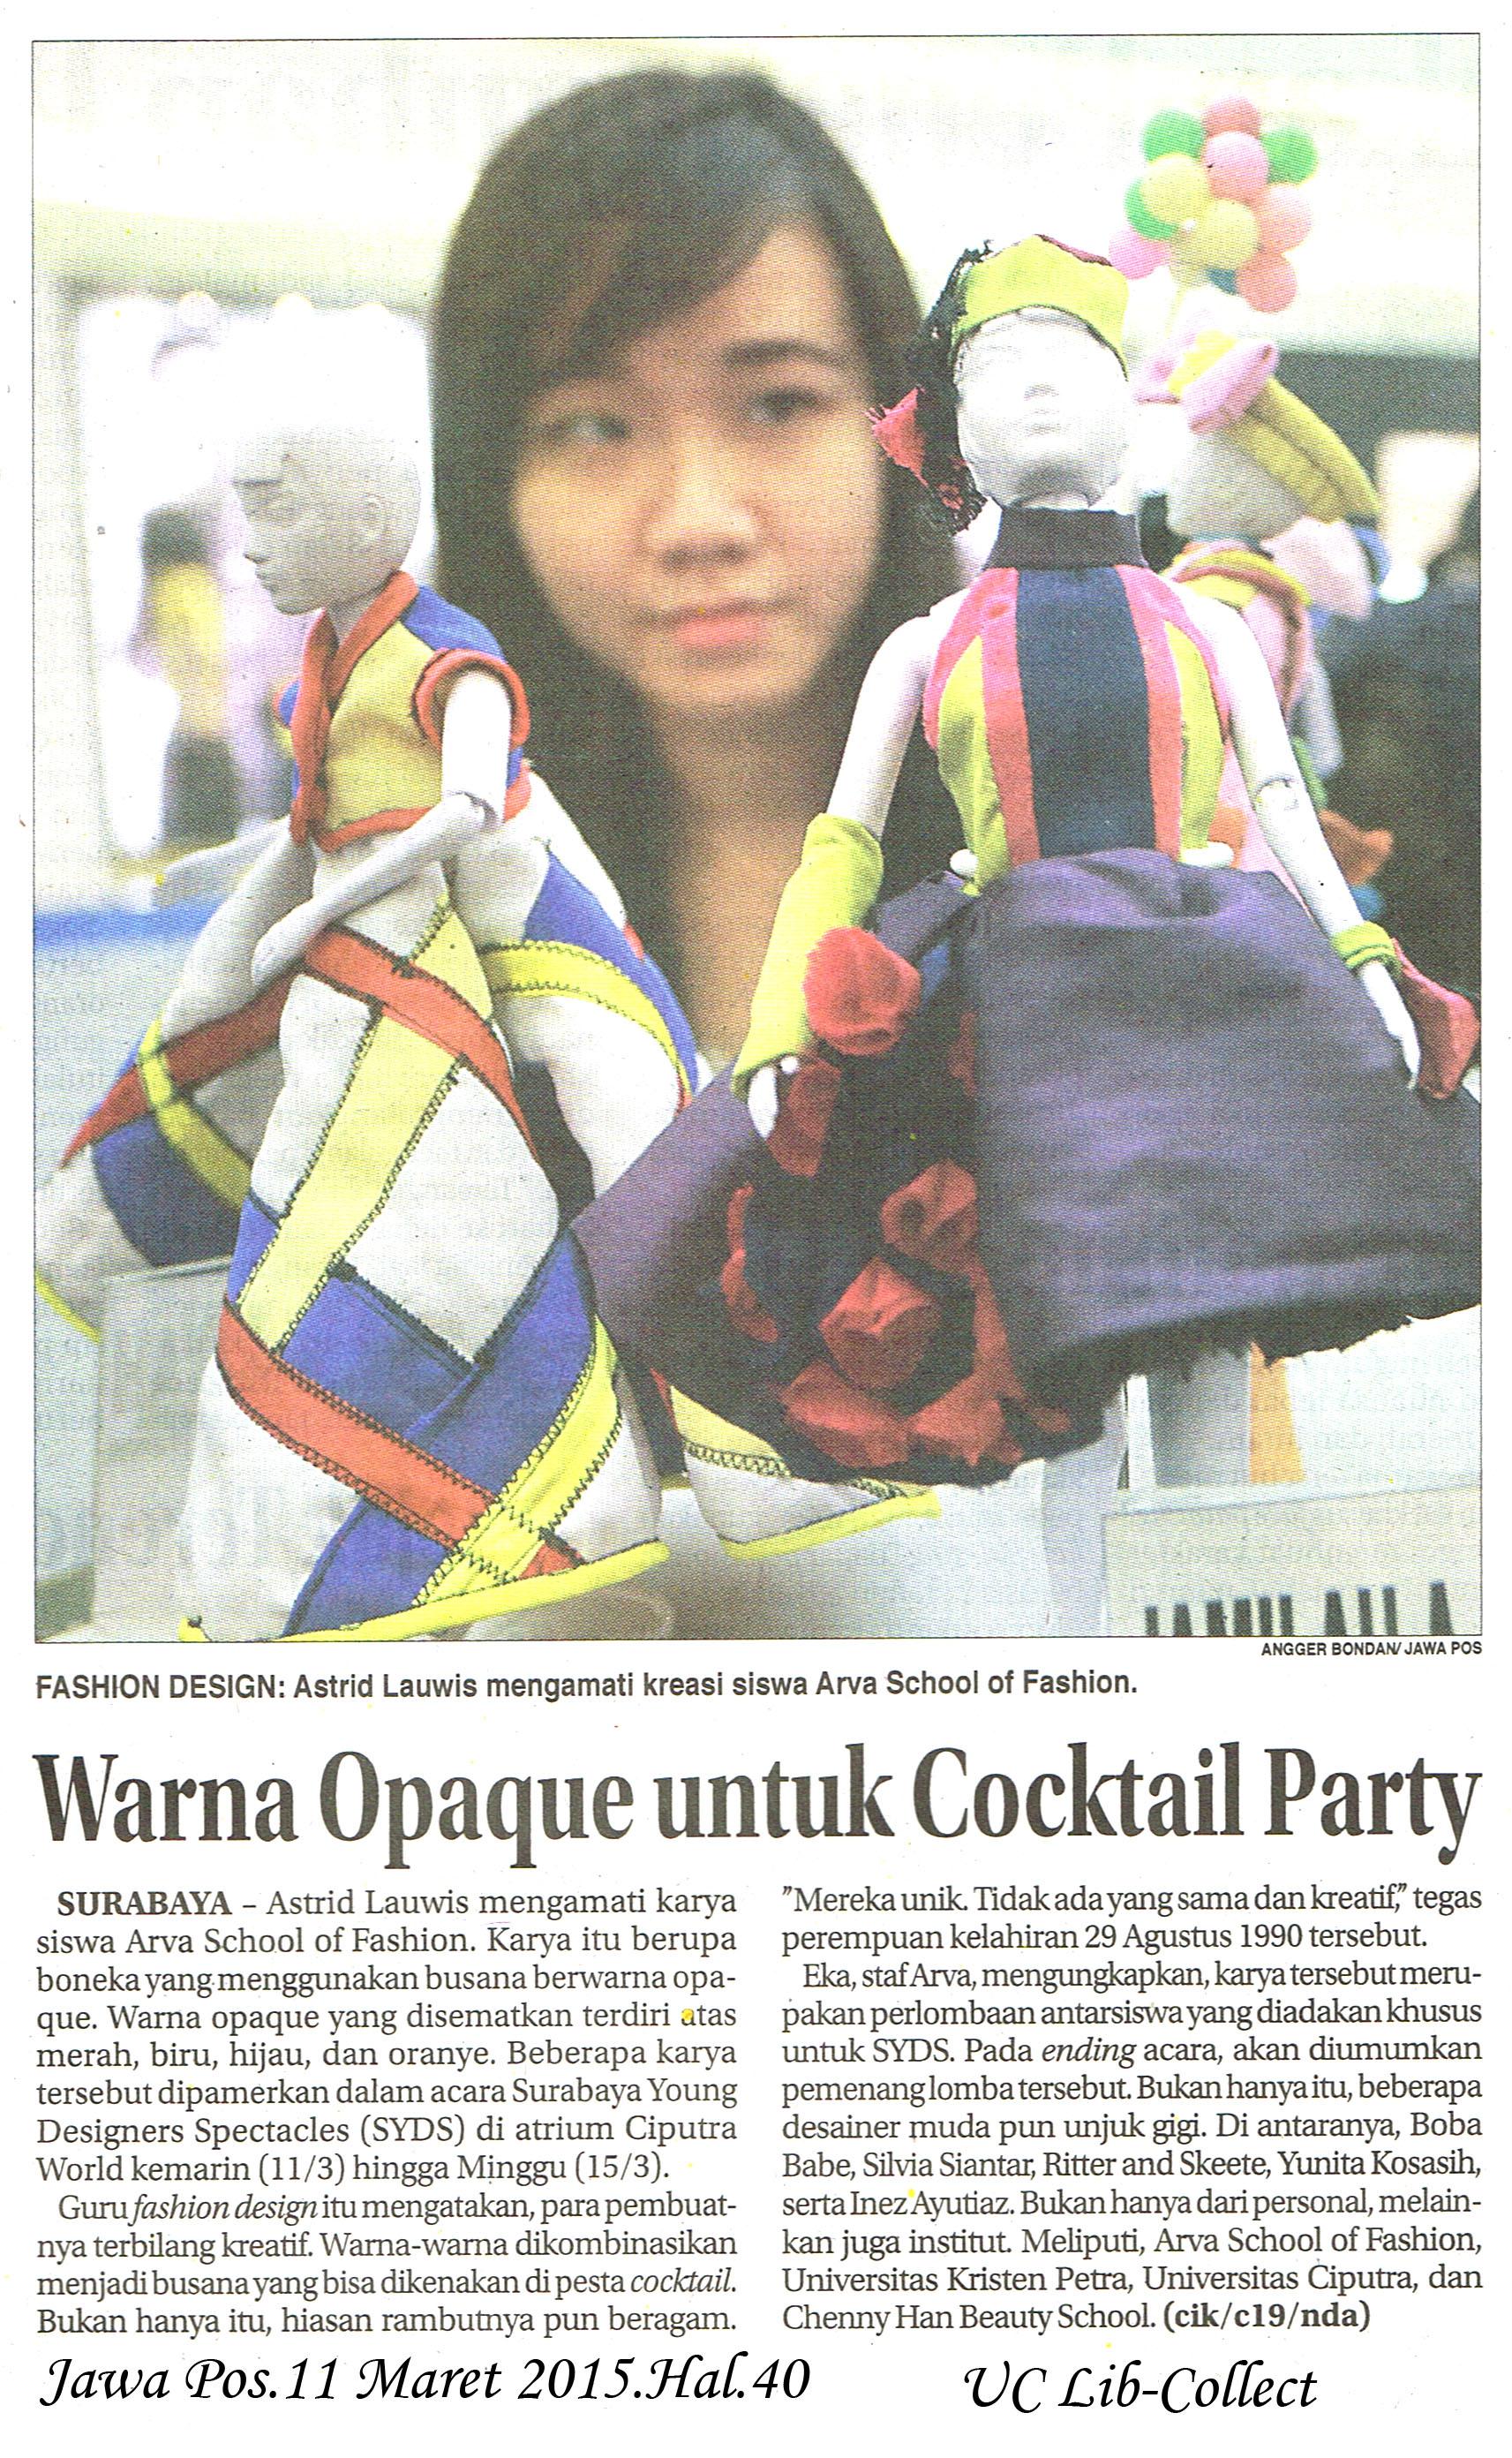 Warna Opaque untuk Cocktail Party. Jawa Pos.11 Maret 2015.Hal.40 db49d30104